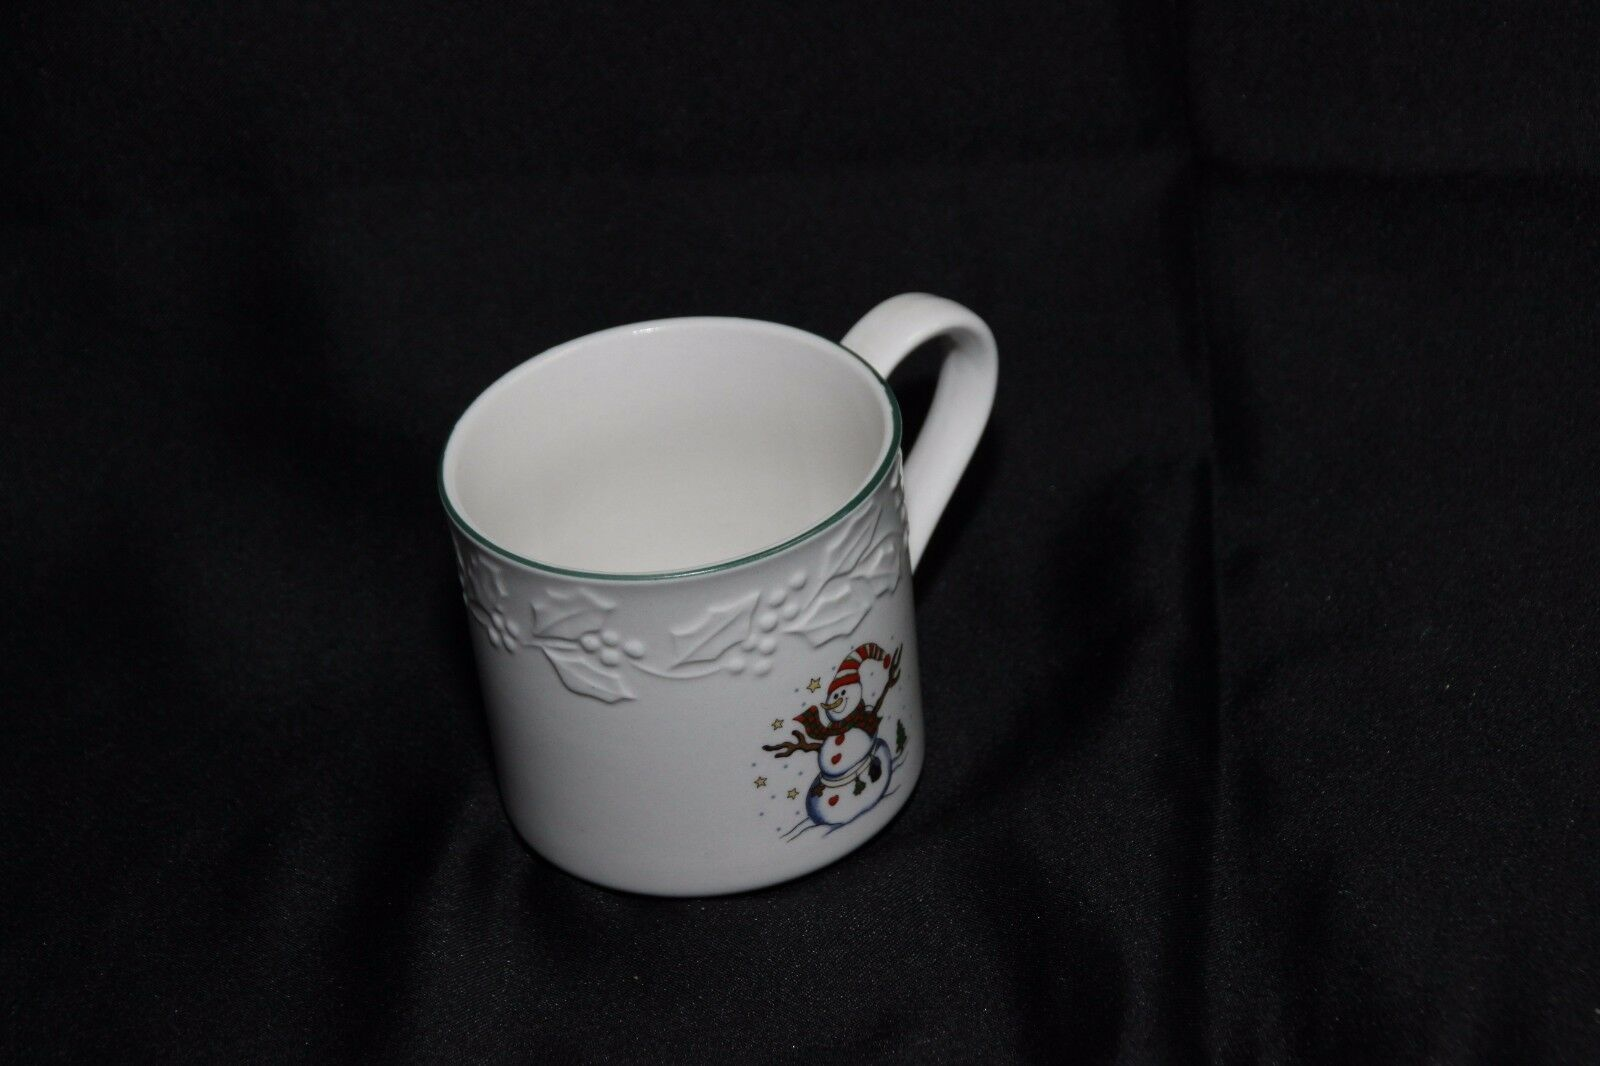 GEI Snowman Xmas 4 Cups 2 Saucers image 5